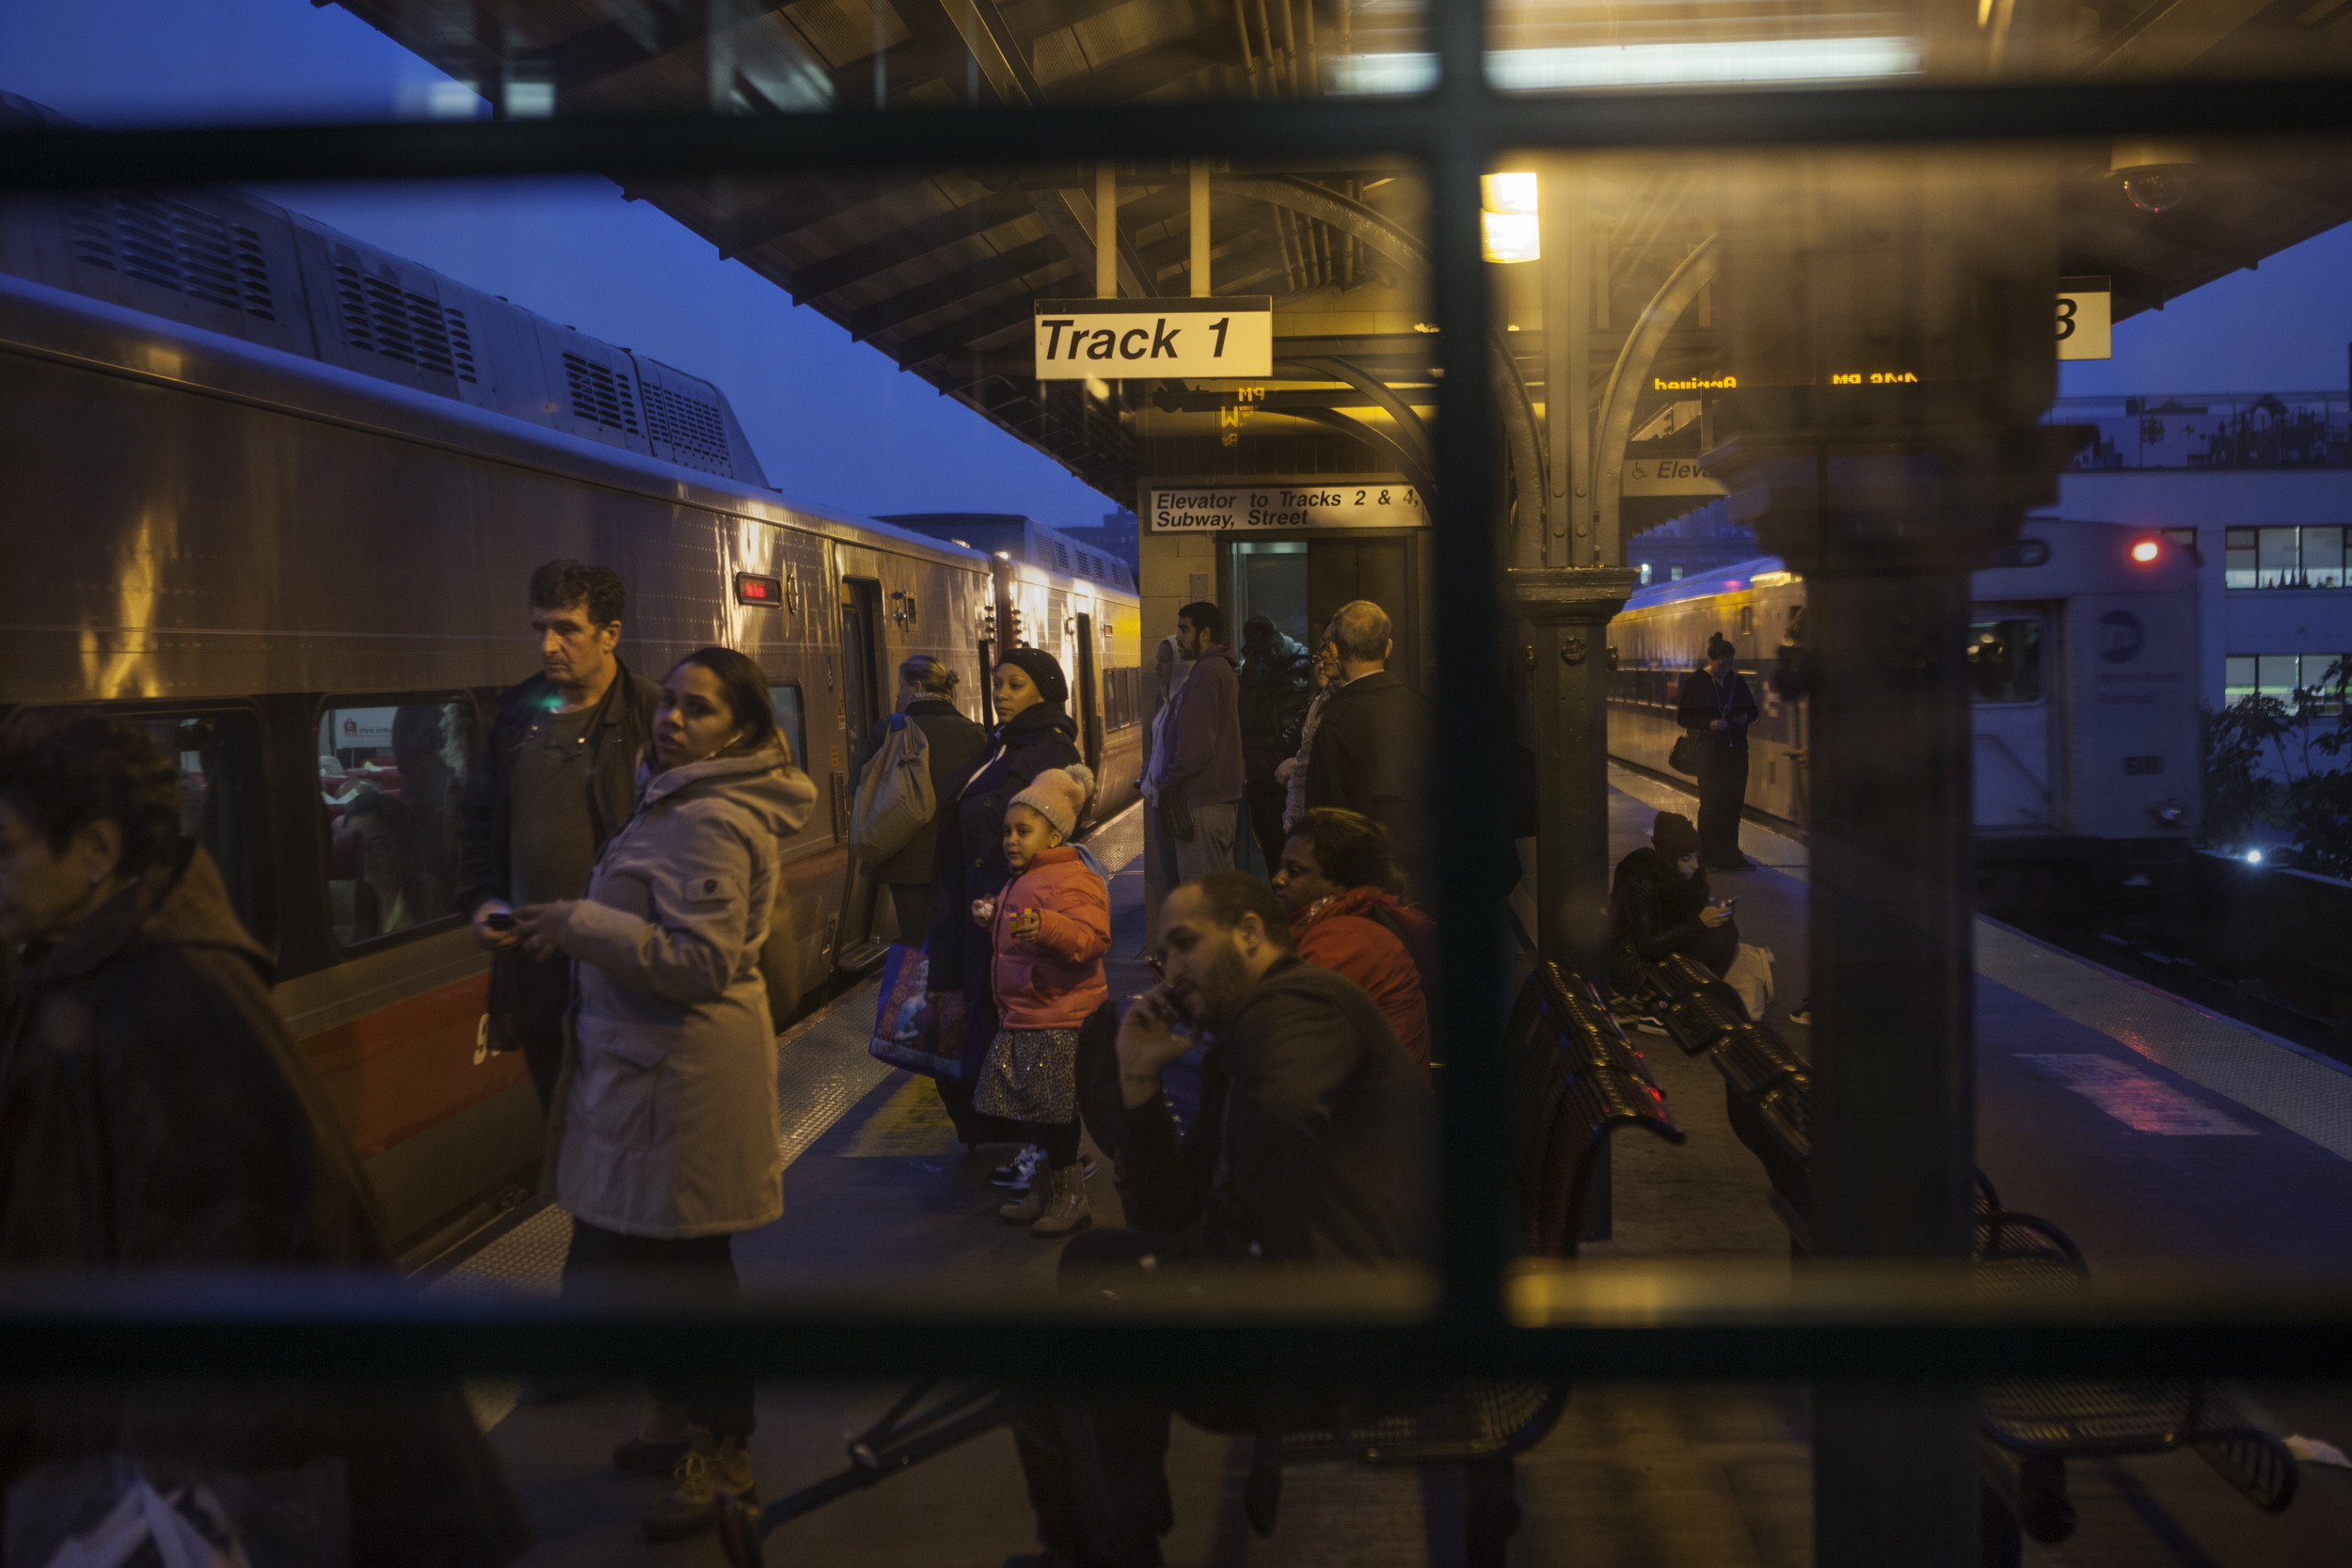 Metro-North train station in Harlem  New York, NY. 2014